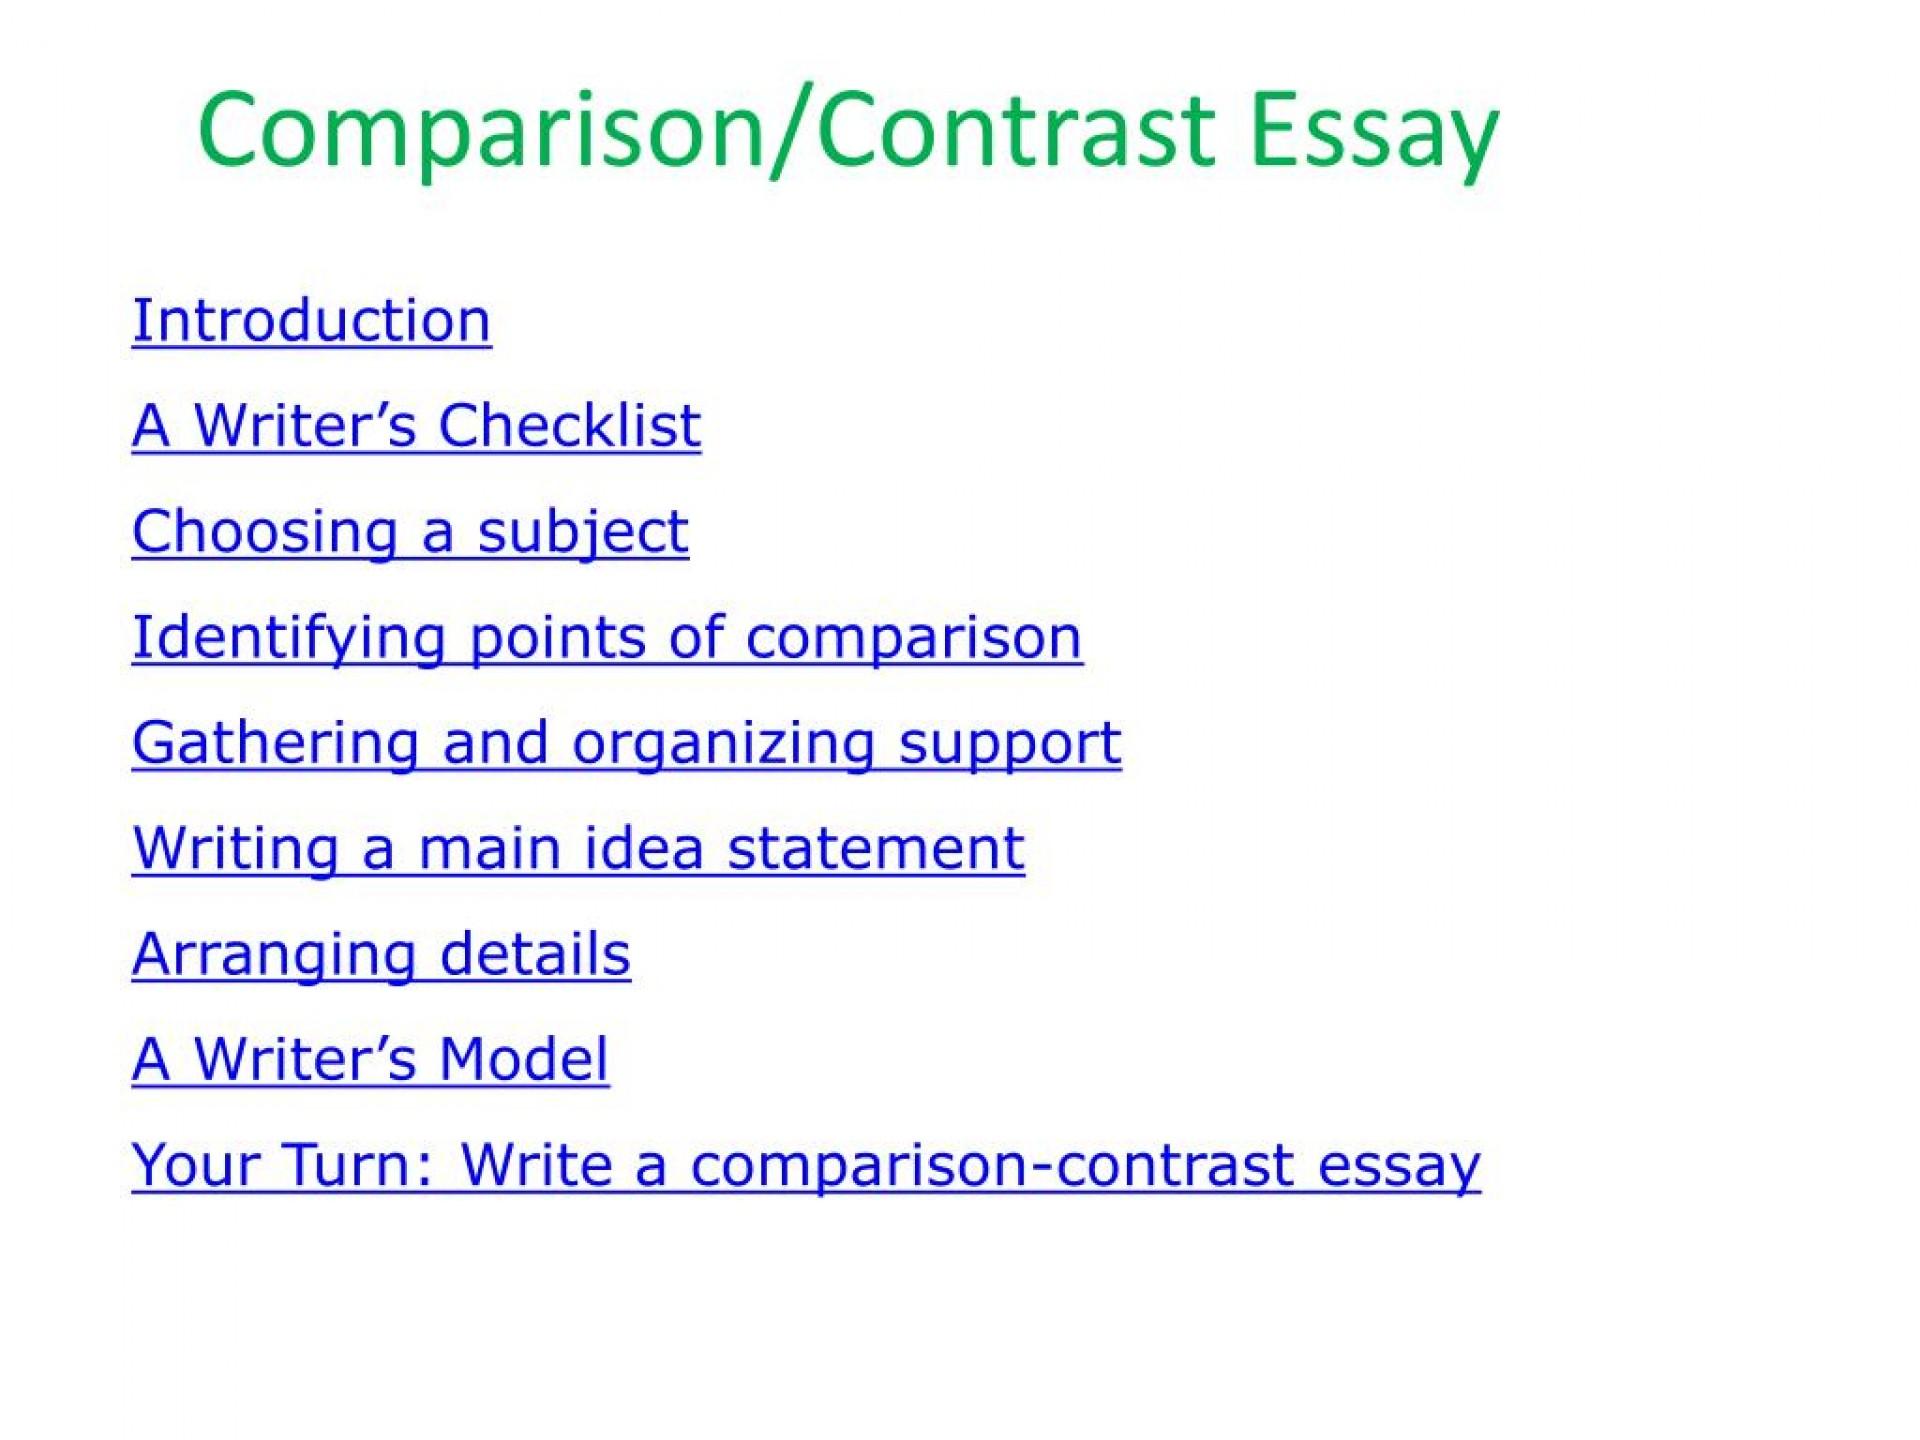 018 Comparison Contrast Essay L Compare And Formidable A Apush Thesis Topics 2017 1920